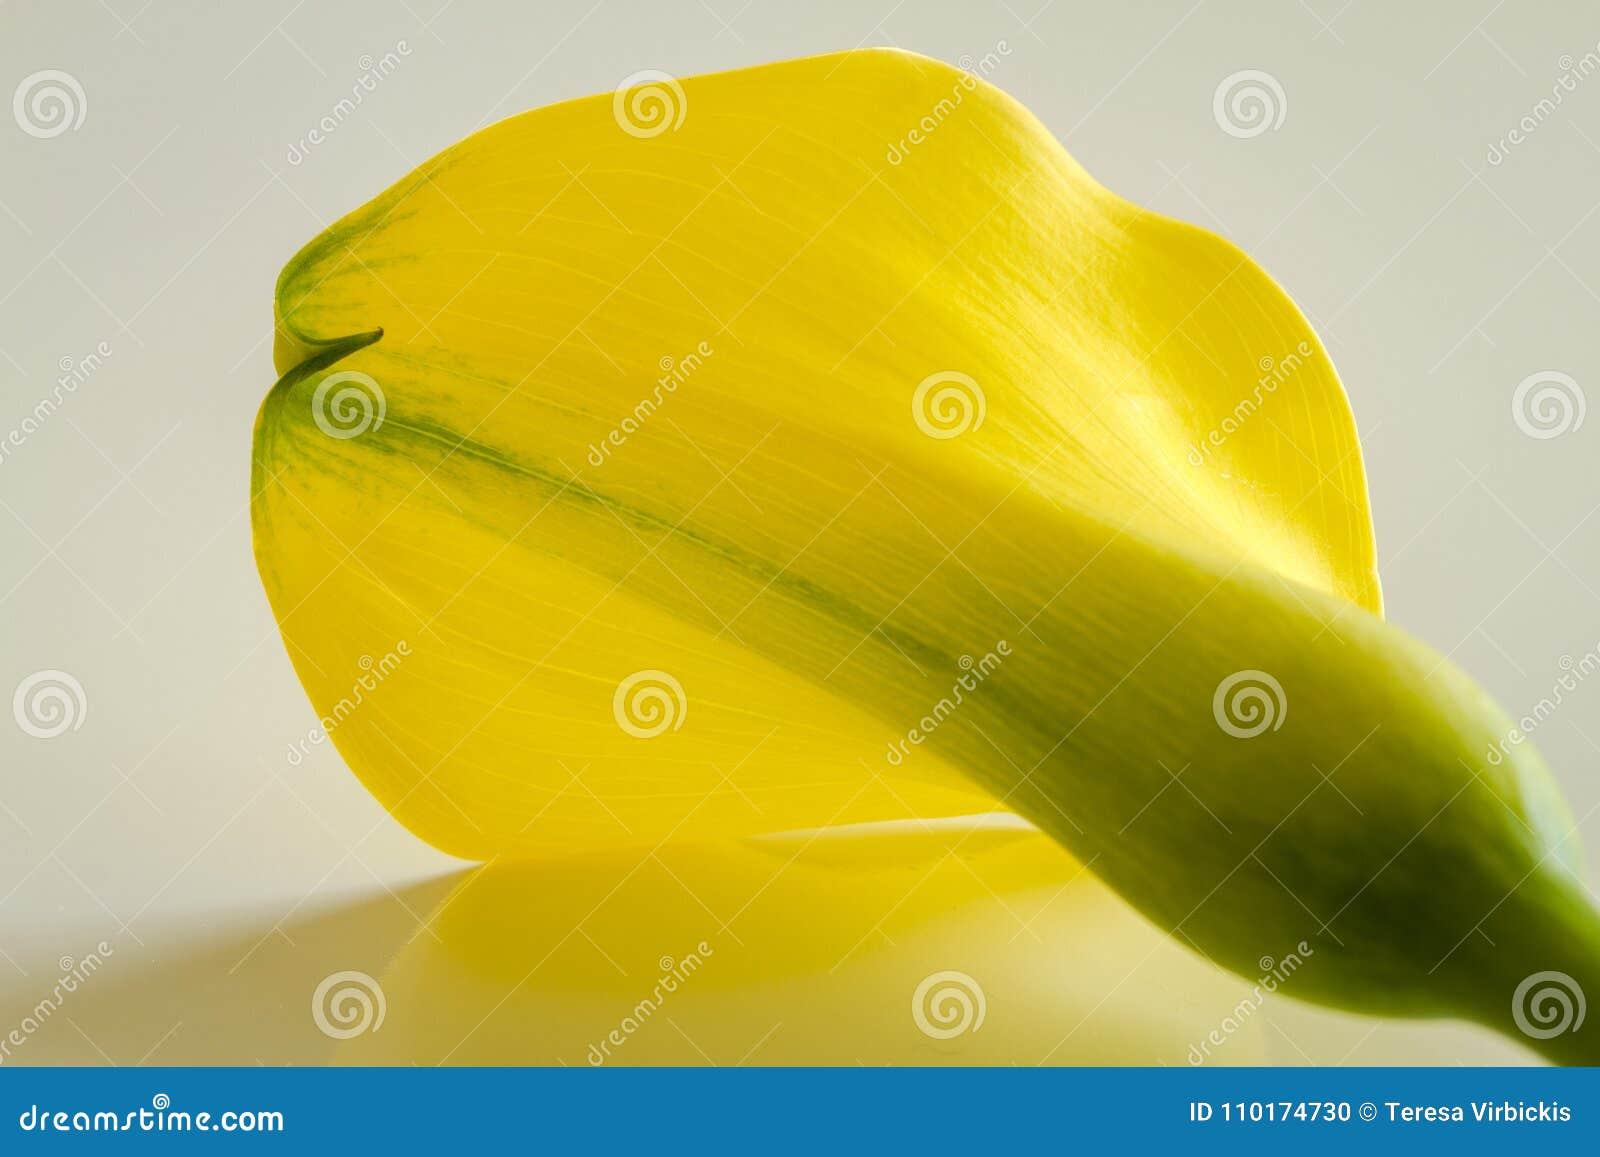 Macro Photos Of Yellow Calla Lily Flowers Stock Photo Image Of